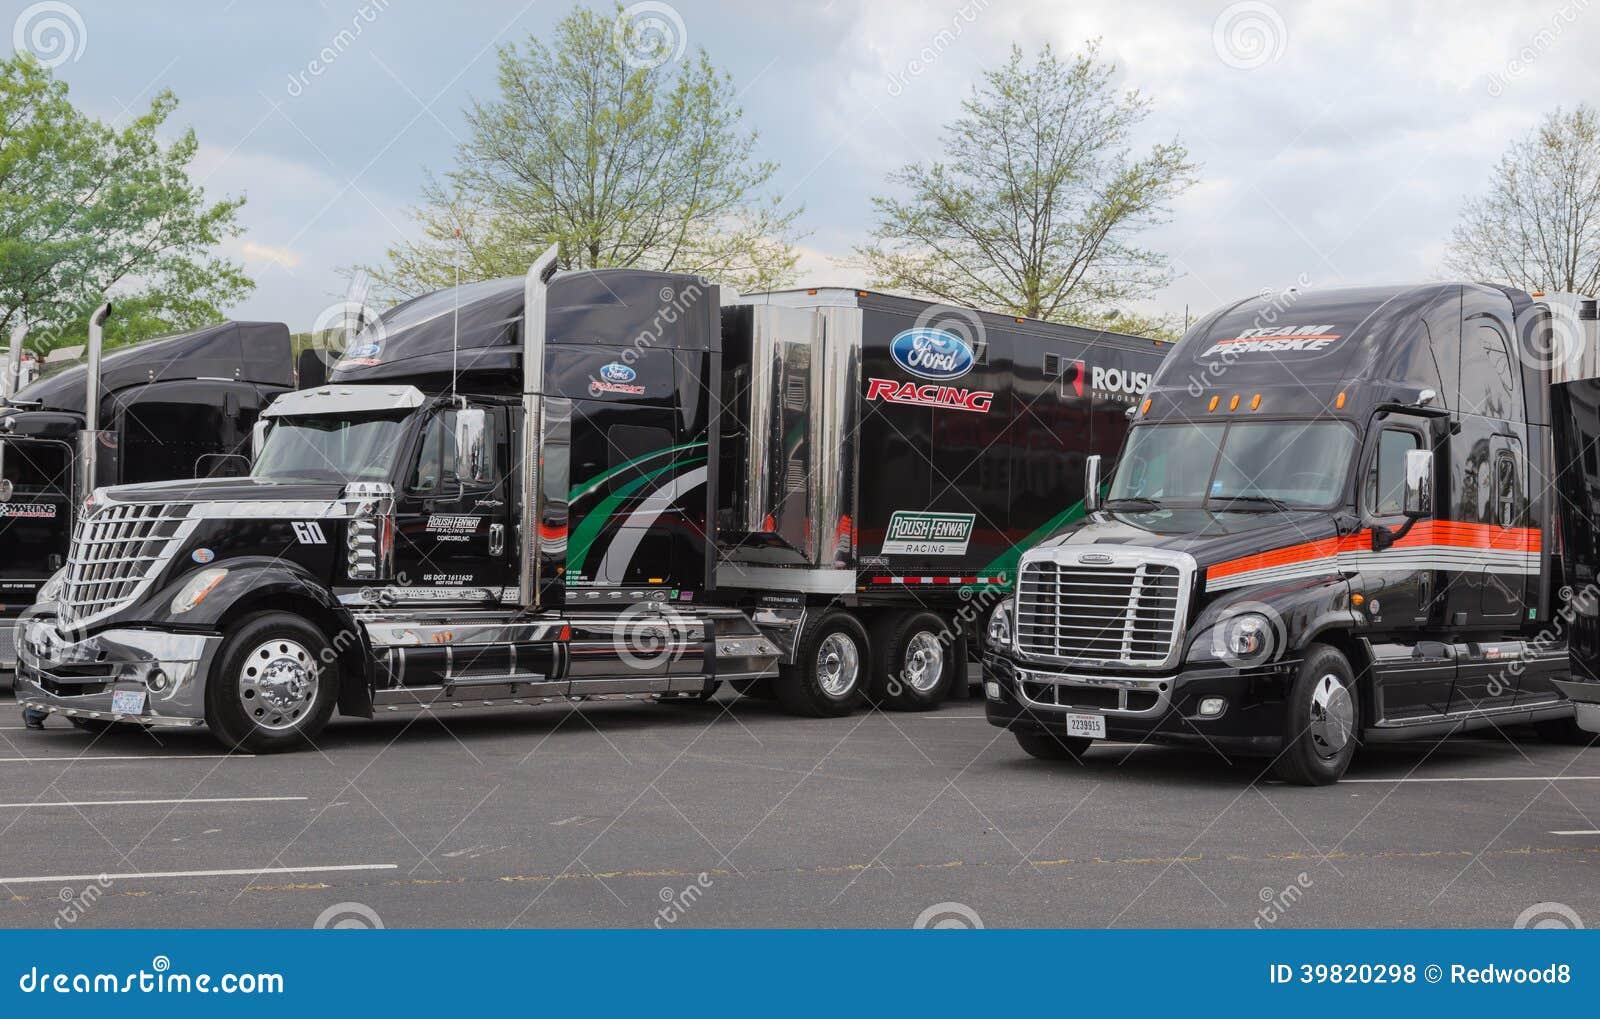 148 best nascar and nascar haulers images on pinterest nascar racing semi trucks and race cars